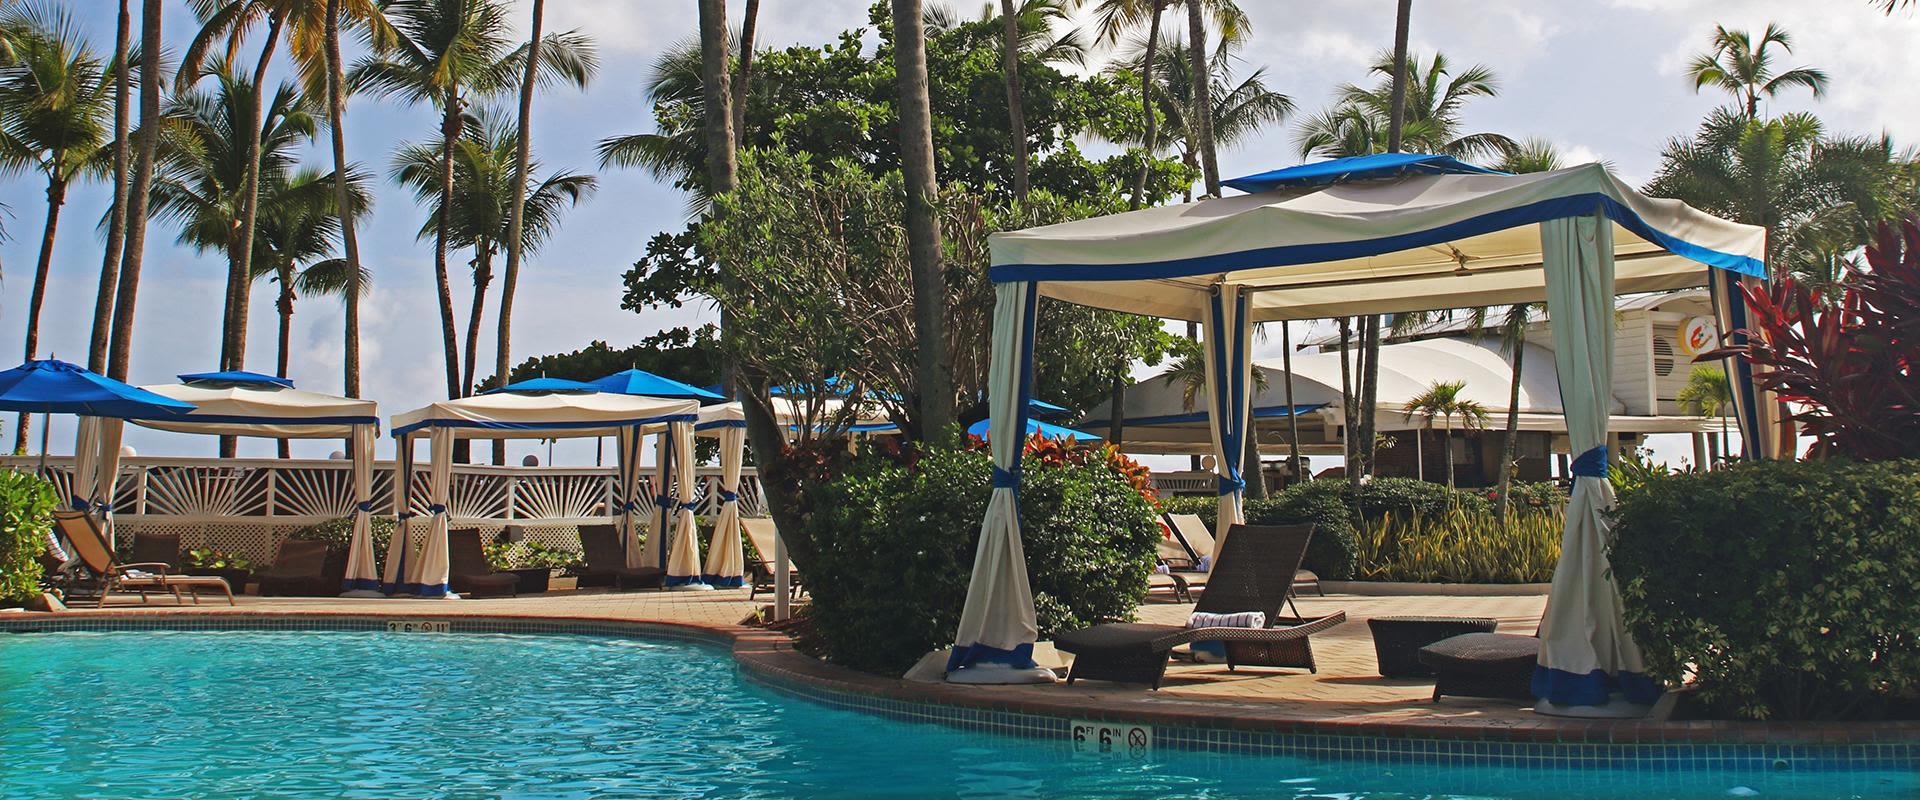 San Juan Resort Poolside Cabanas